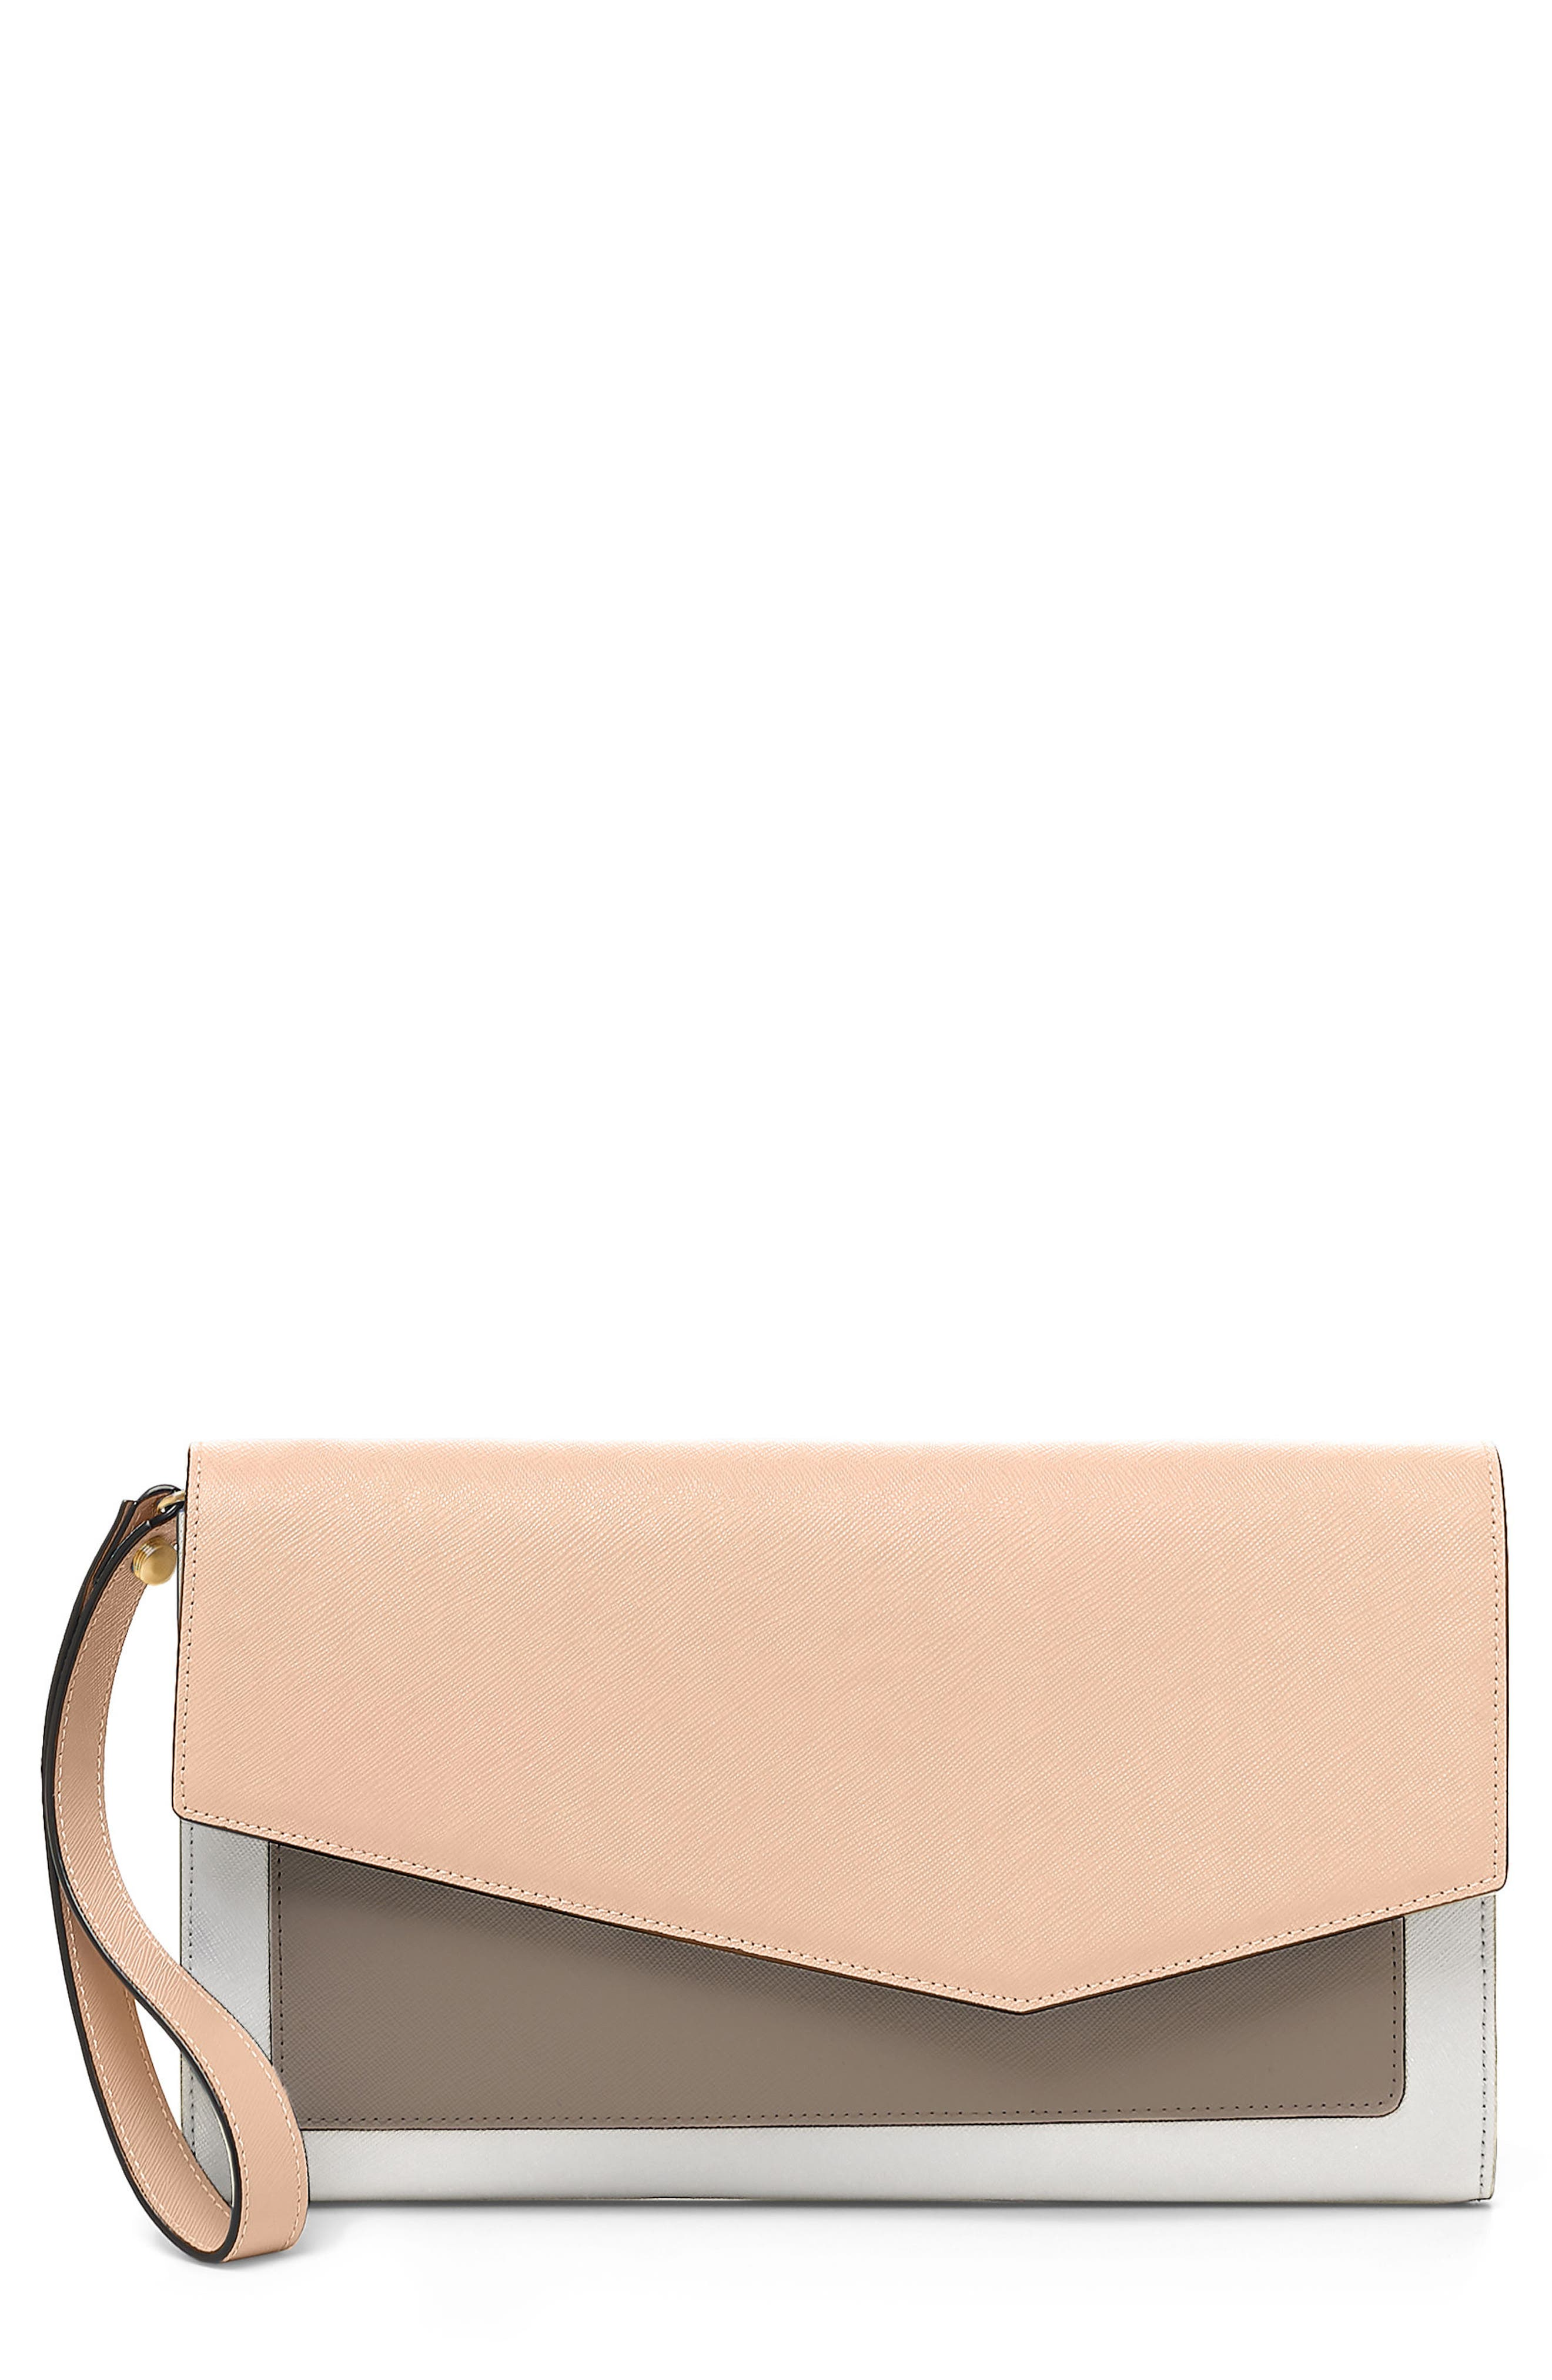 Cobble Hill Leather Wallet,                         Main,                         color, Peach Colorblock